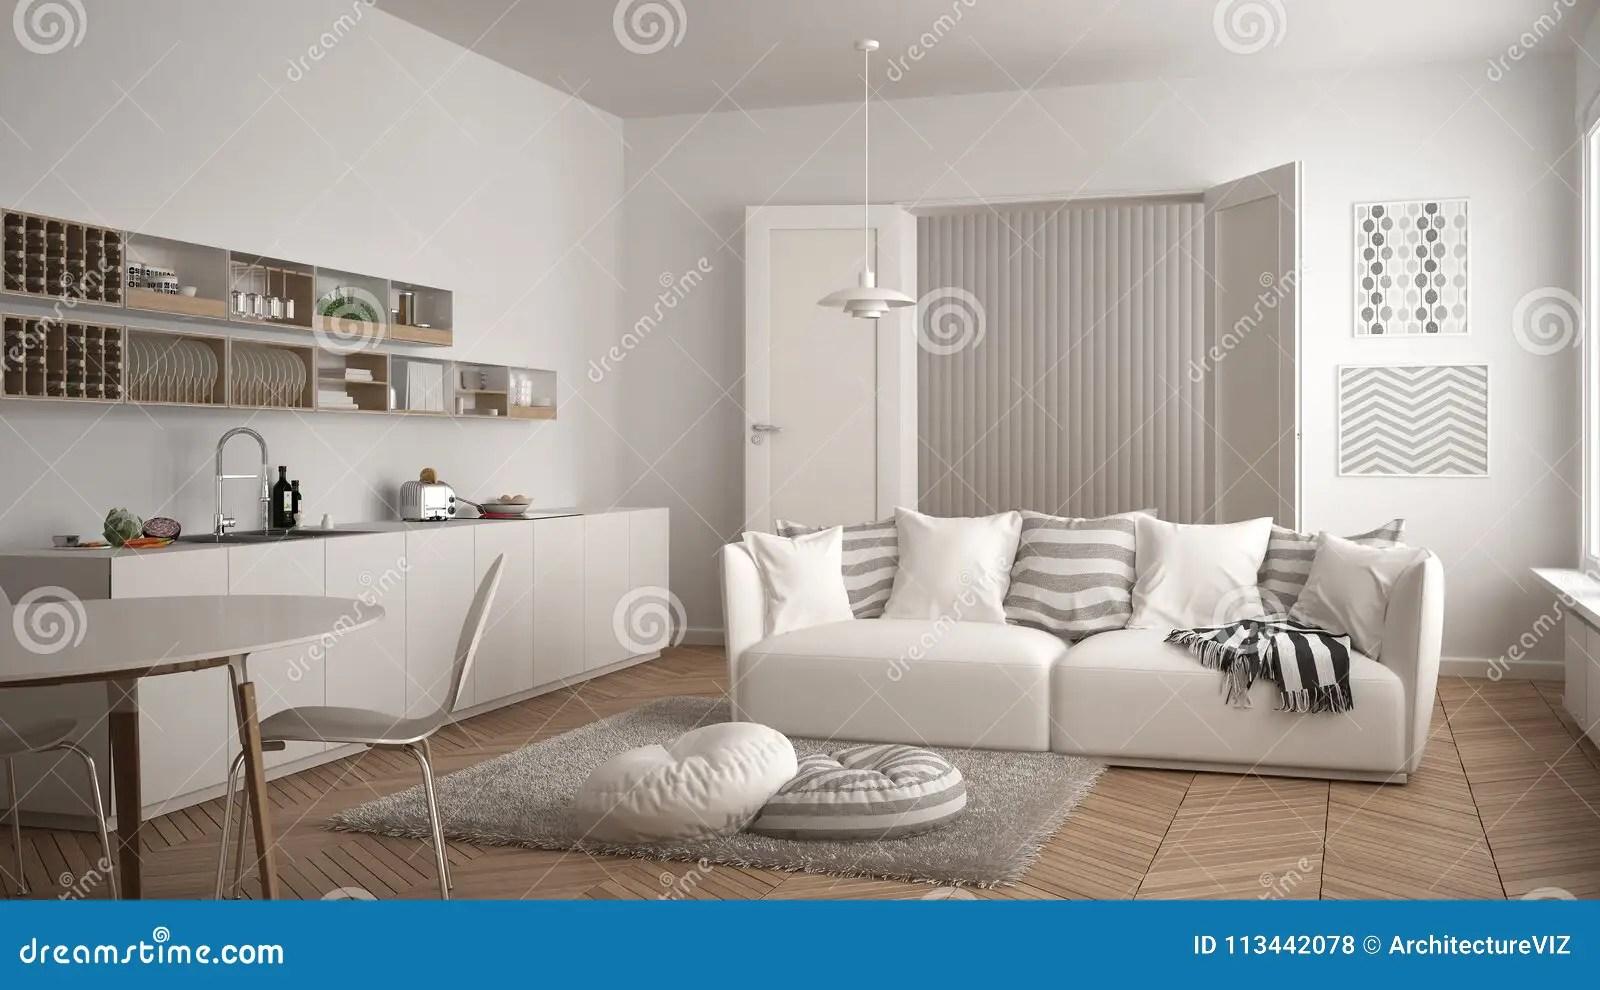 kitchen dining tables pan rack 有厨房 餐桌 沙发和地毯的与枕头 最低纲领派白色建筑学内部desi斯堪的 最低纲领派白色